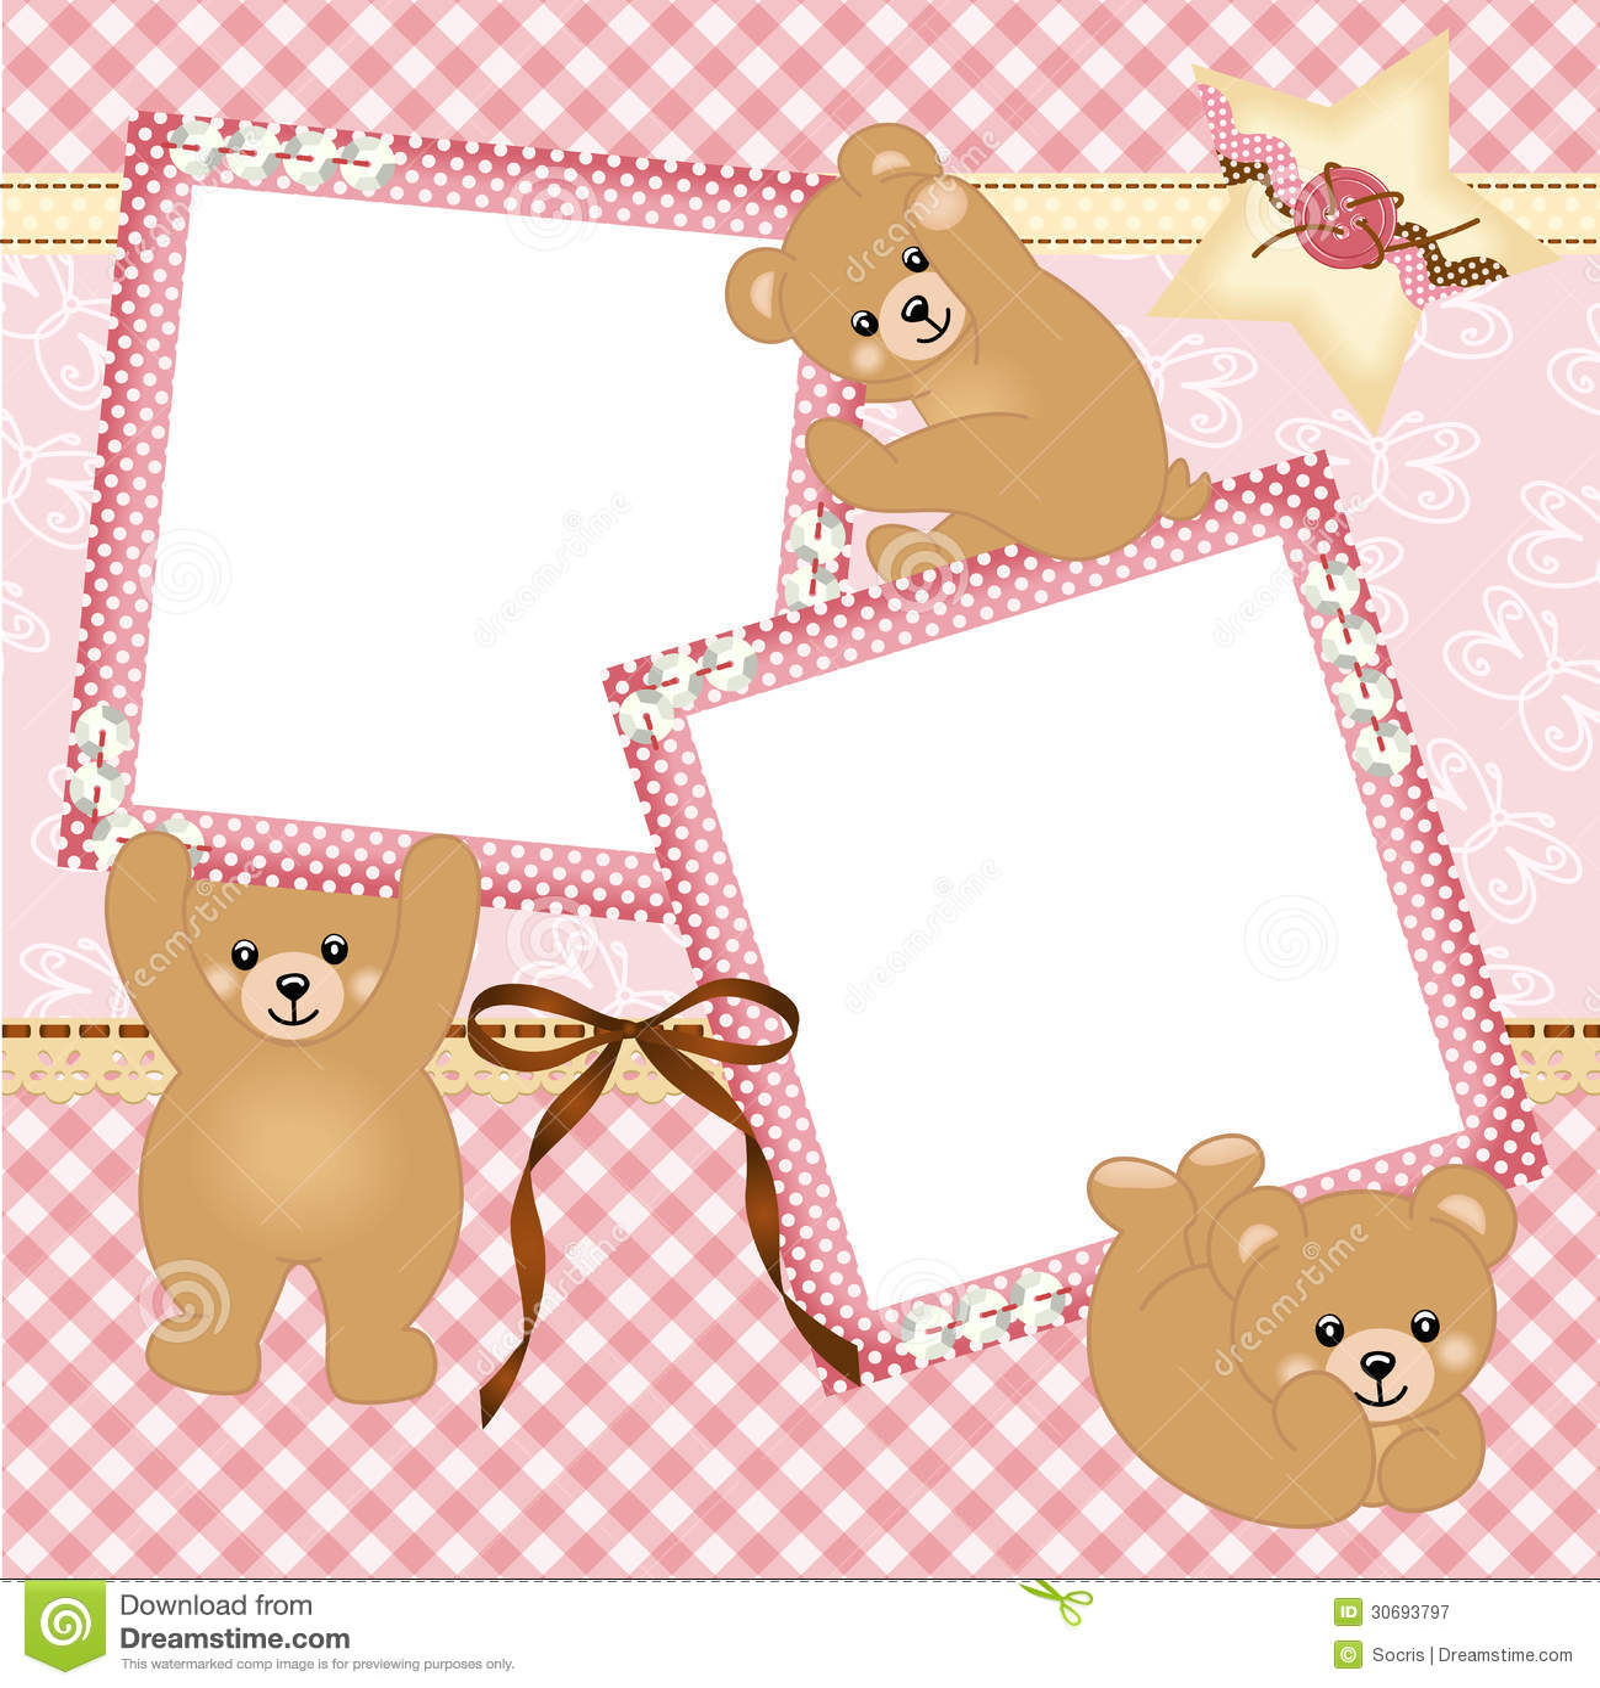 Baby Girl Photo Frame With Teddy Bear Stock Vector Image 30693797